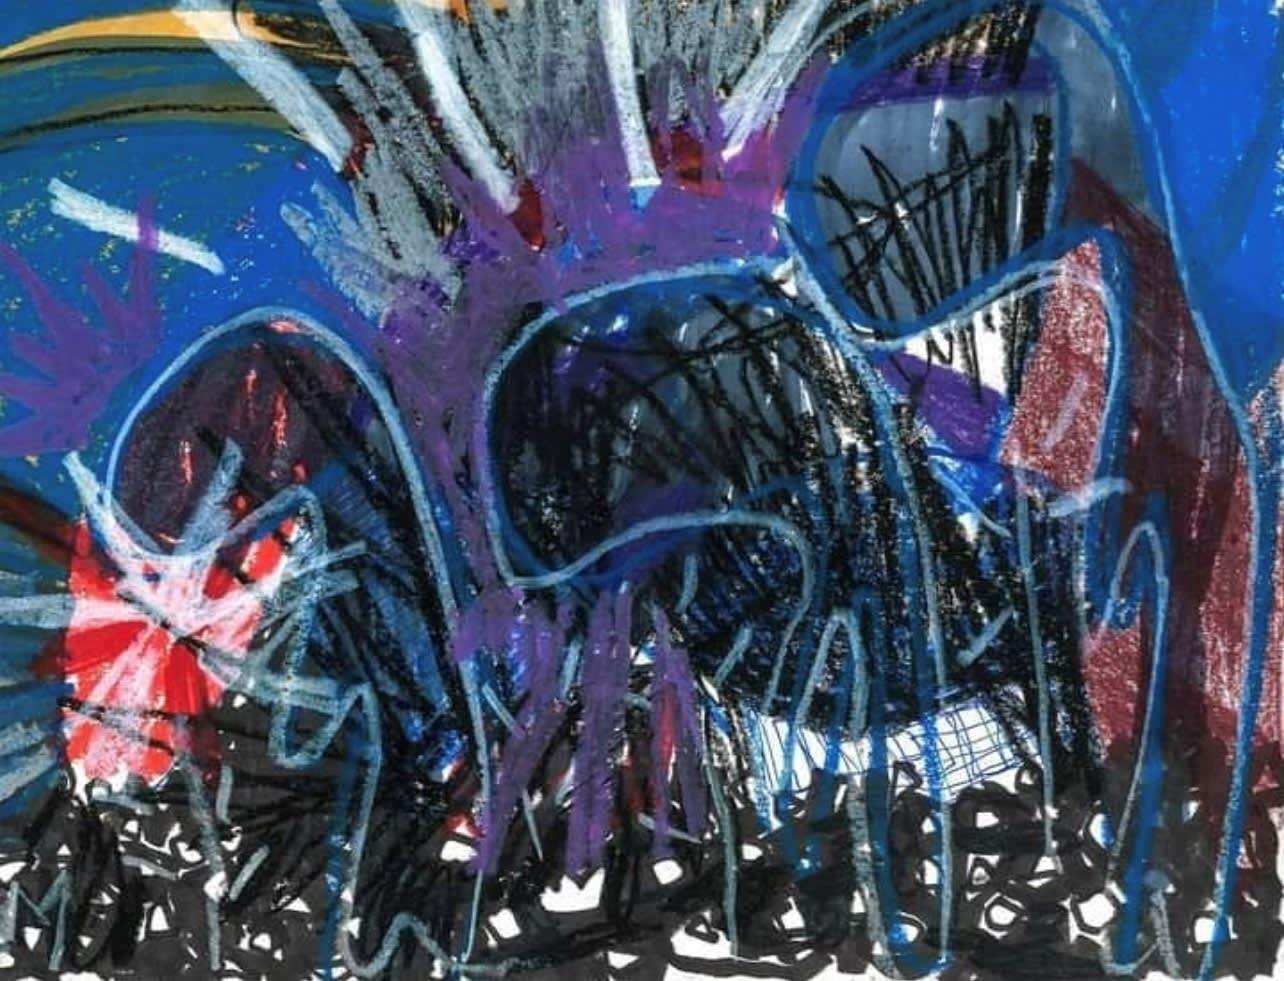 Cristina Muñiz Organized Pain, 2020 Crayon, Sakura marker on paper 12 x 9 in 30.5 x 22.9 cm